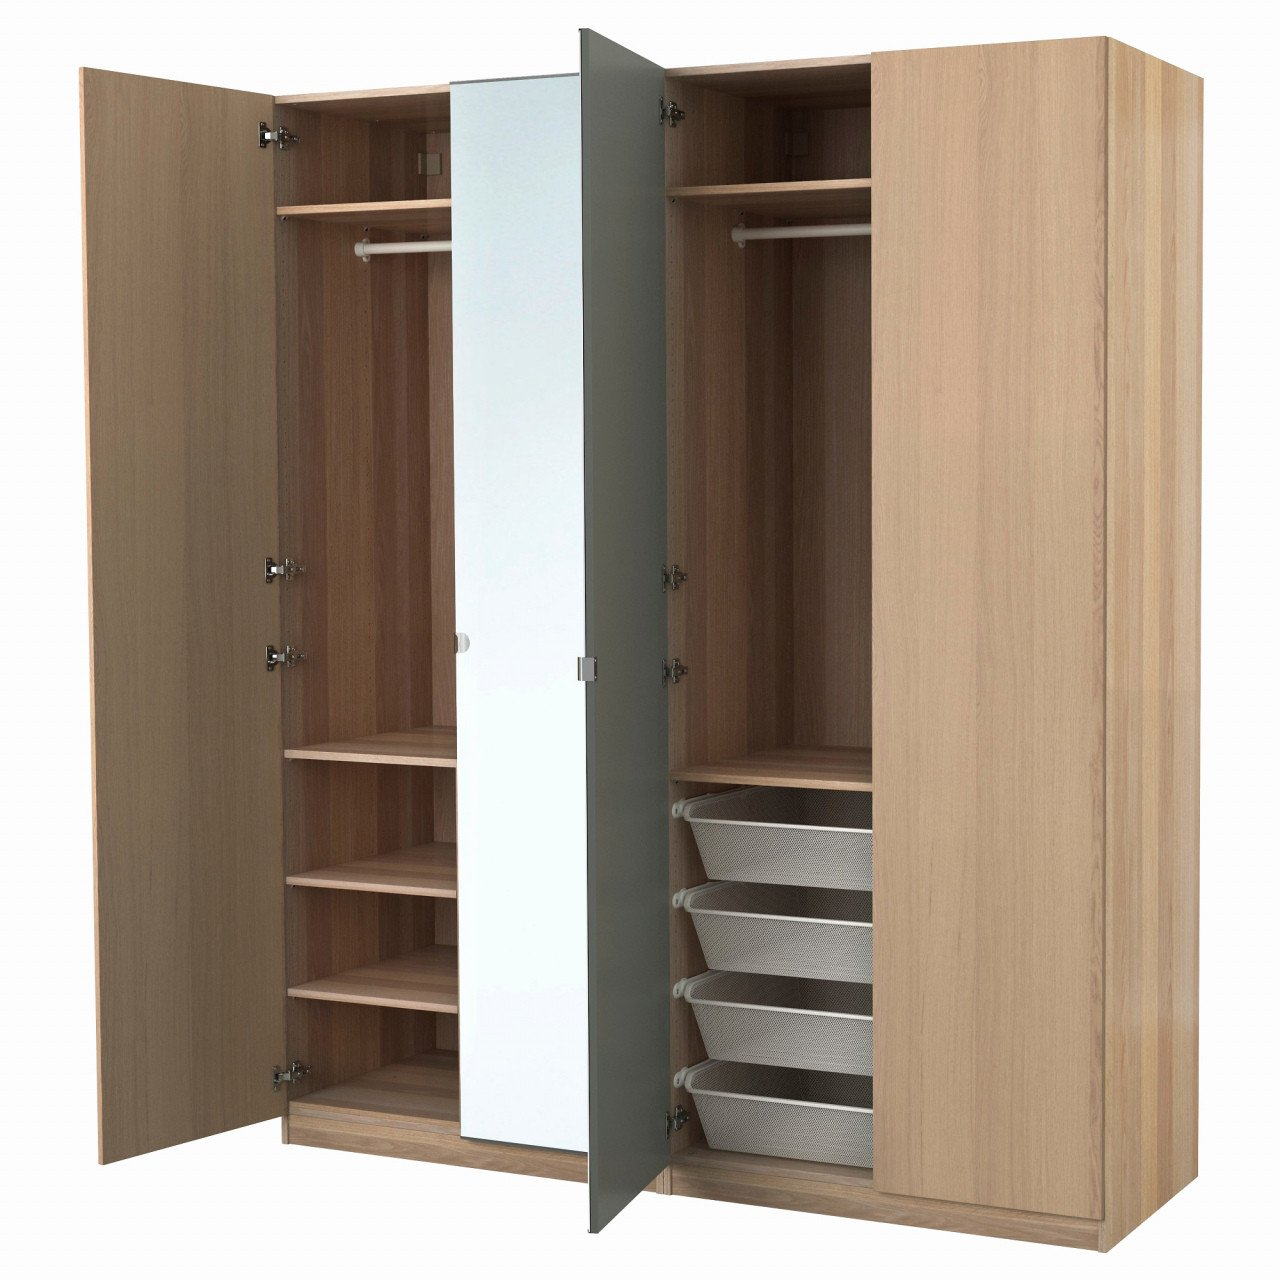 Ikea Bedroom Furniture Wardrobes Inspirational Ikea Dresser Hemnes Pax Ikea Anleitung Neu Ikea Pax Hasvik